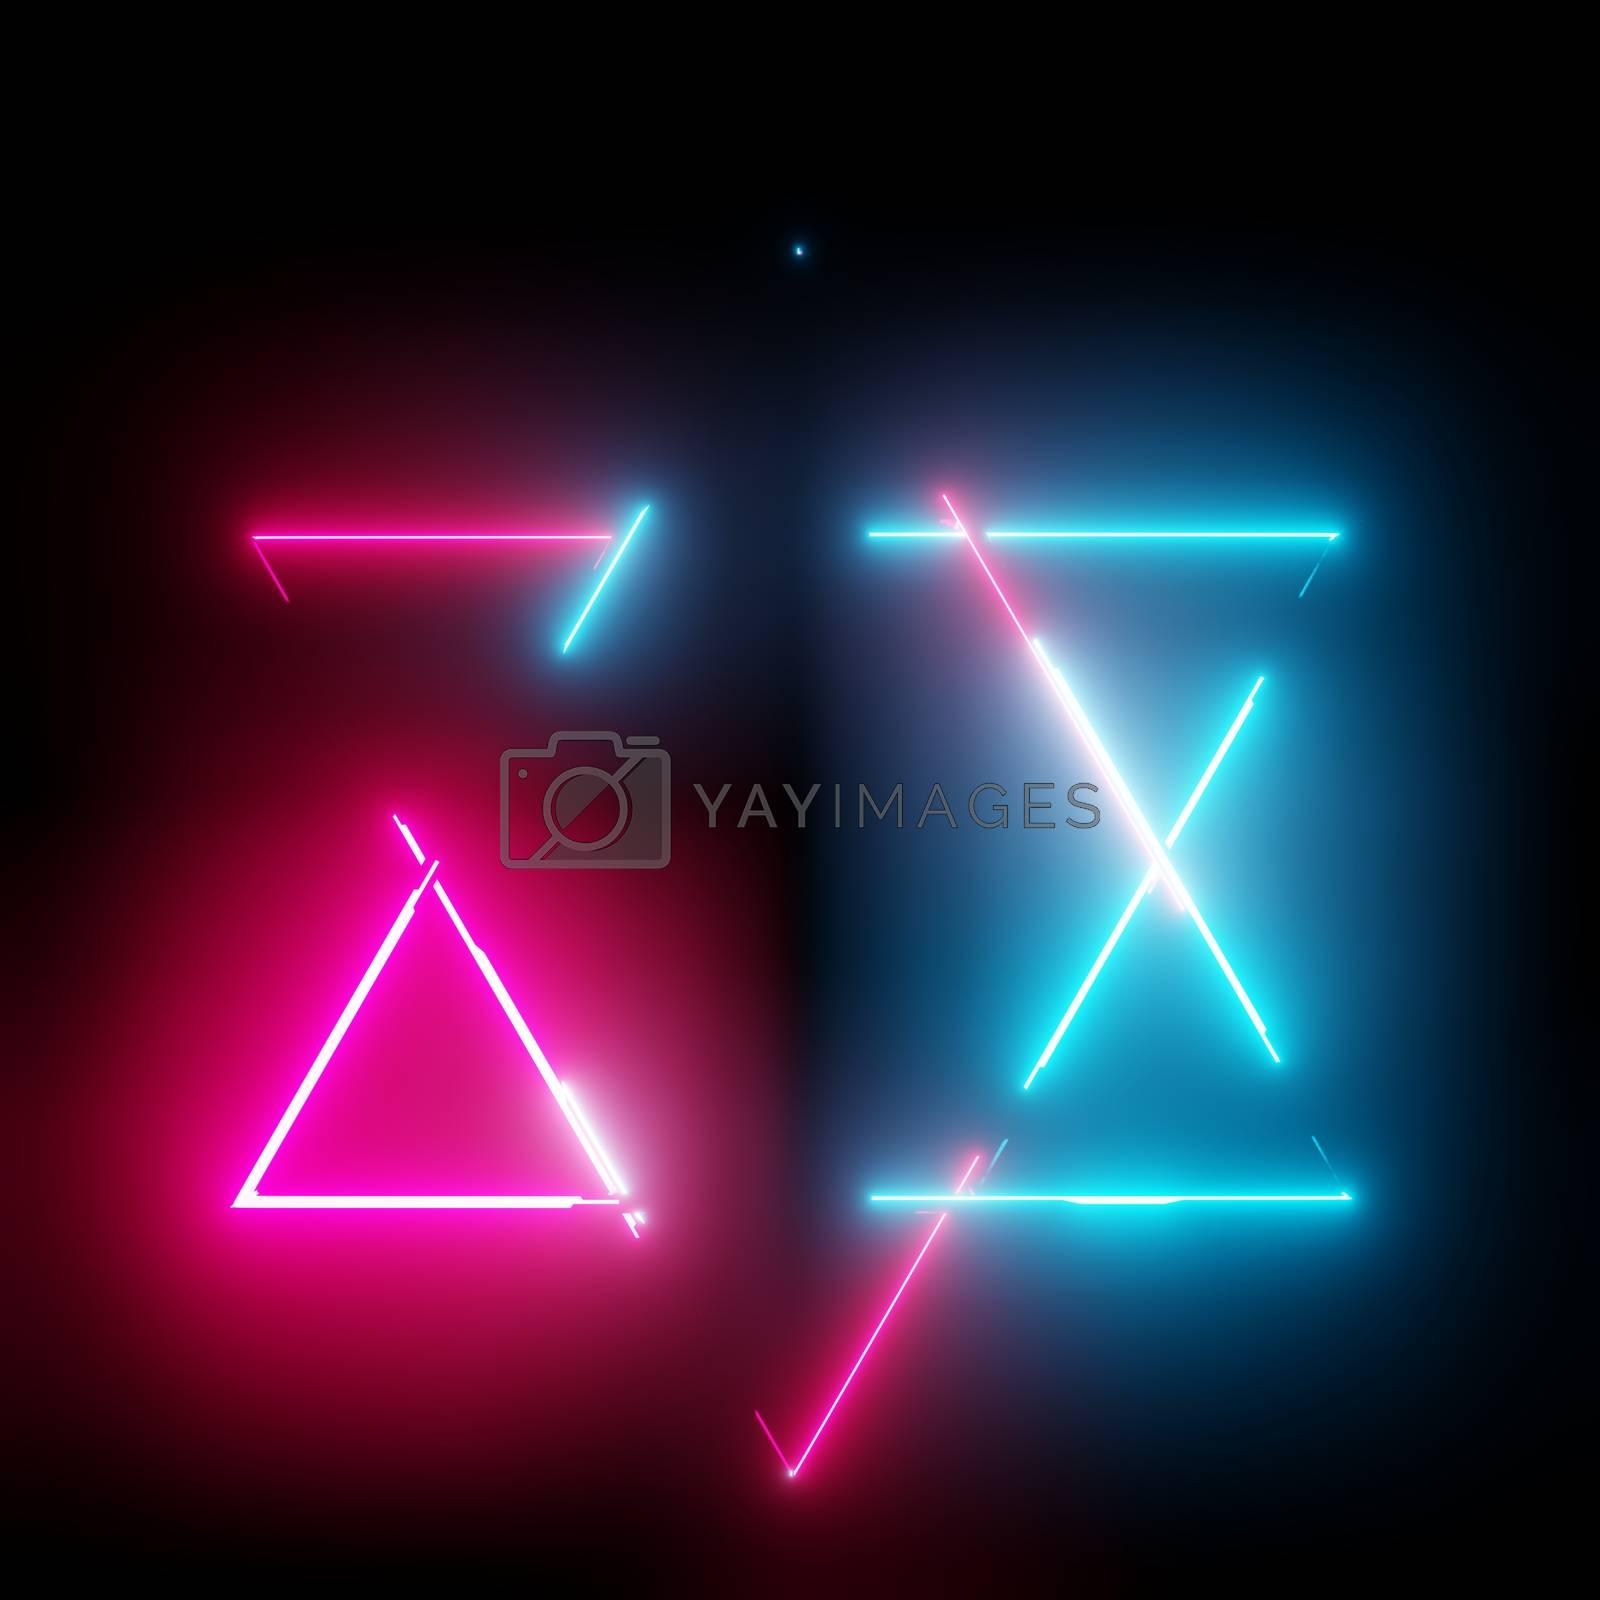 Neon light triangles frame on dark background. 3D illustration